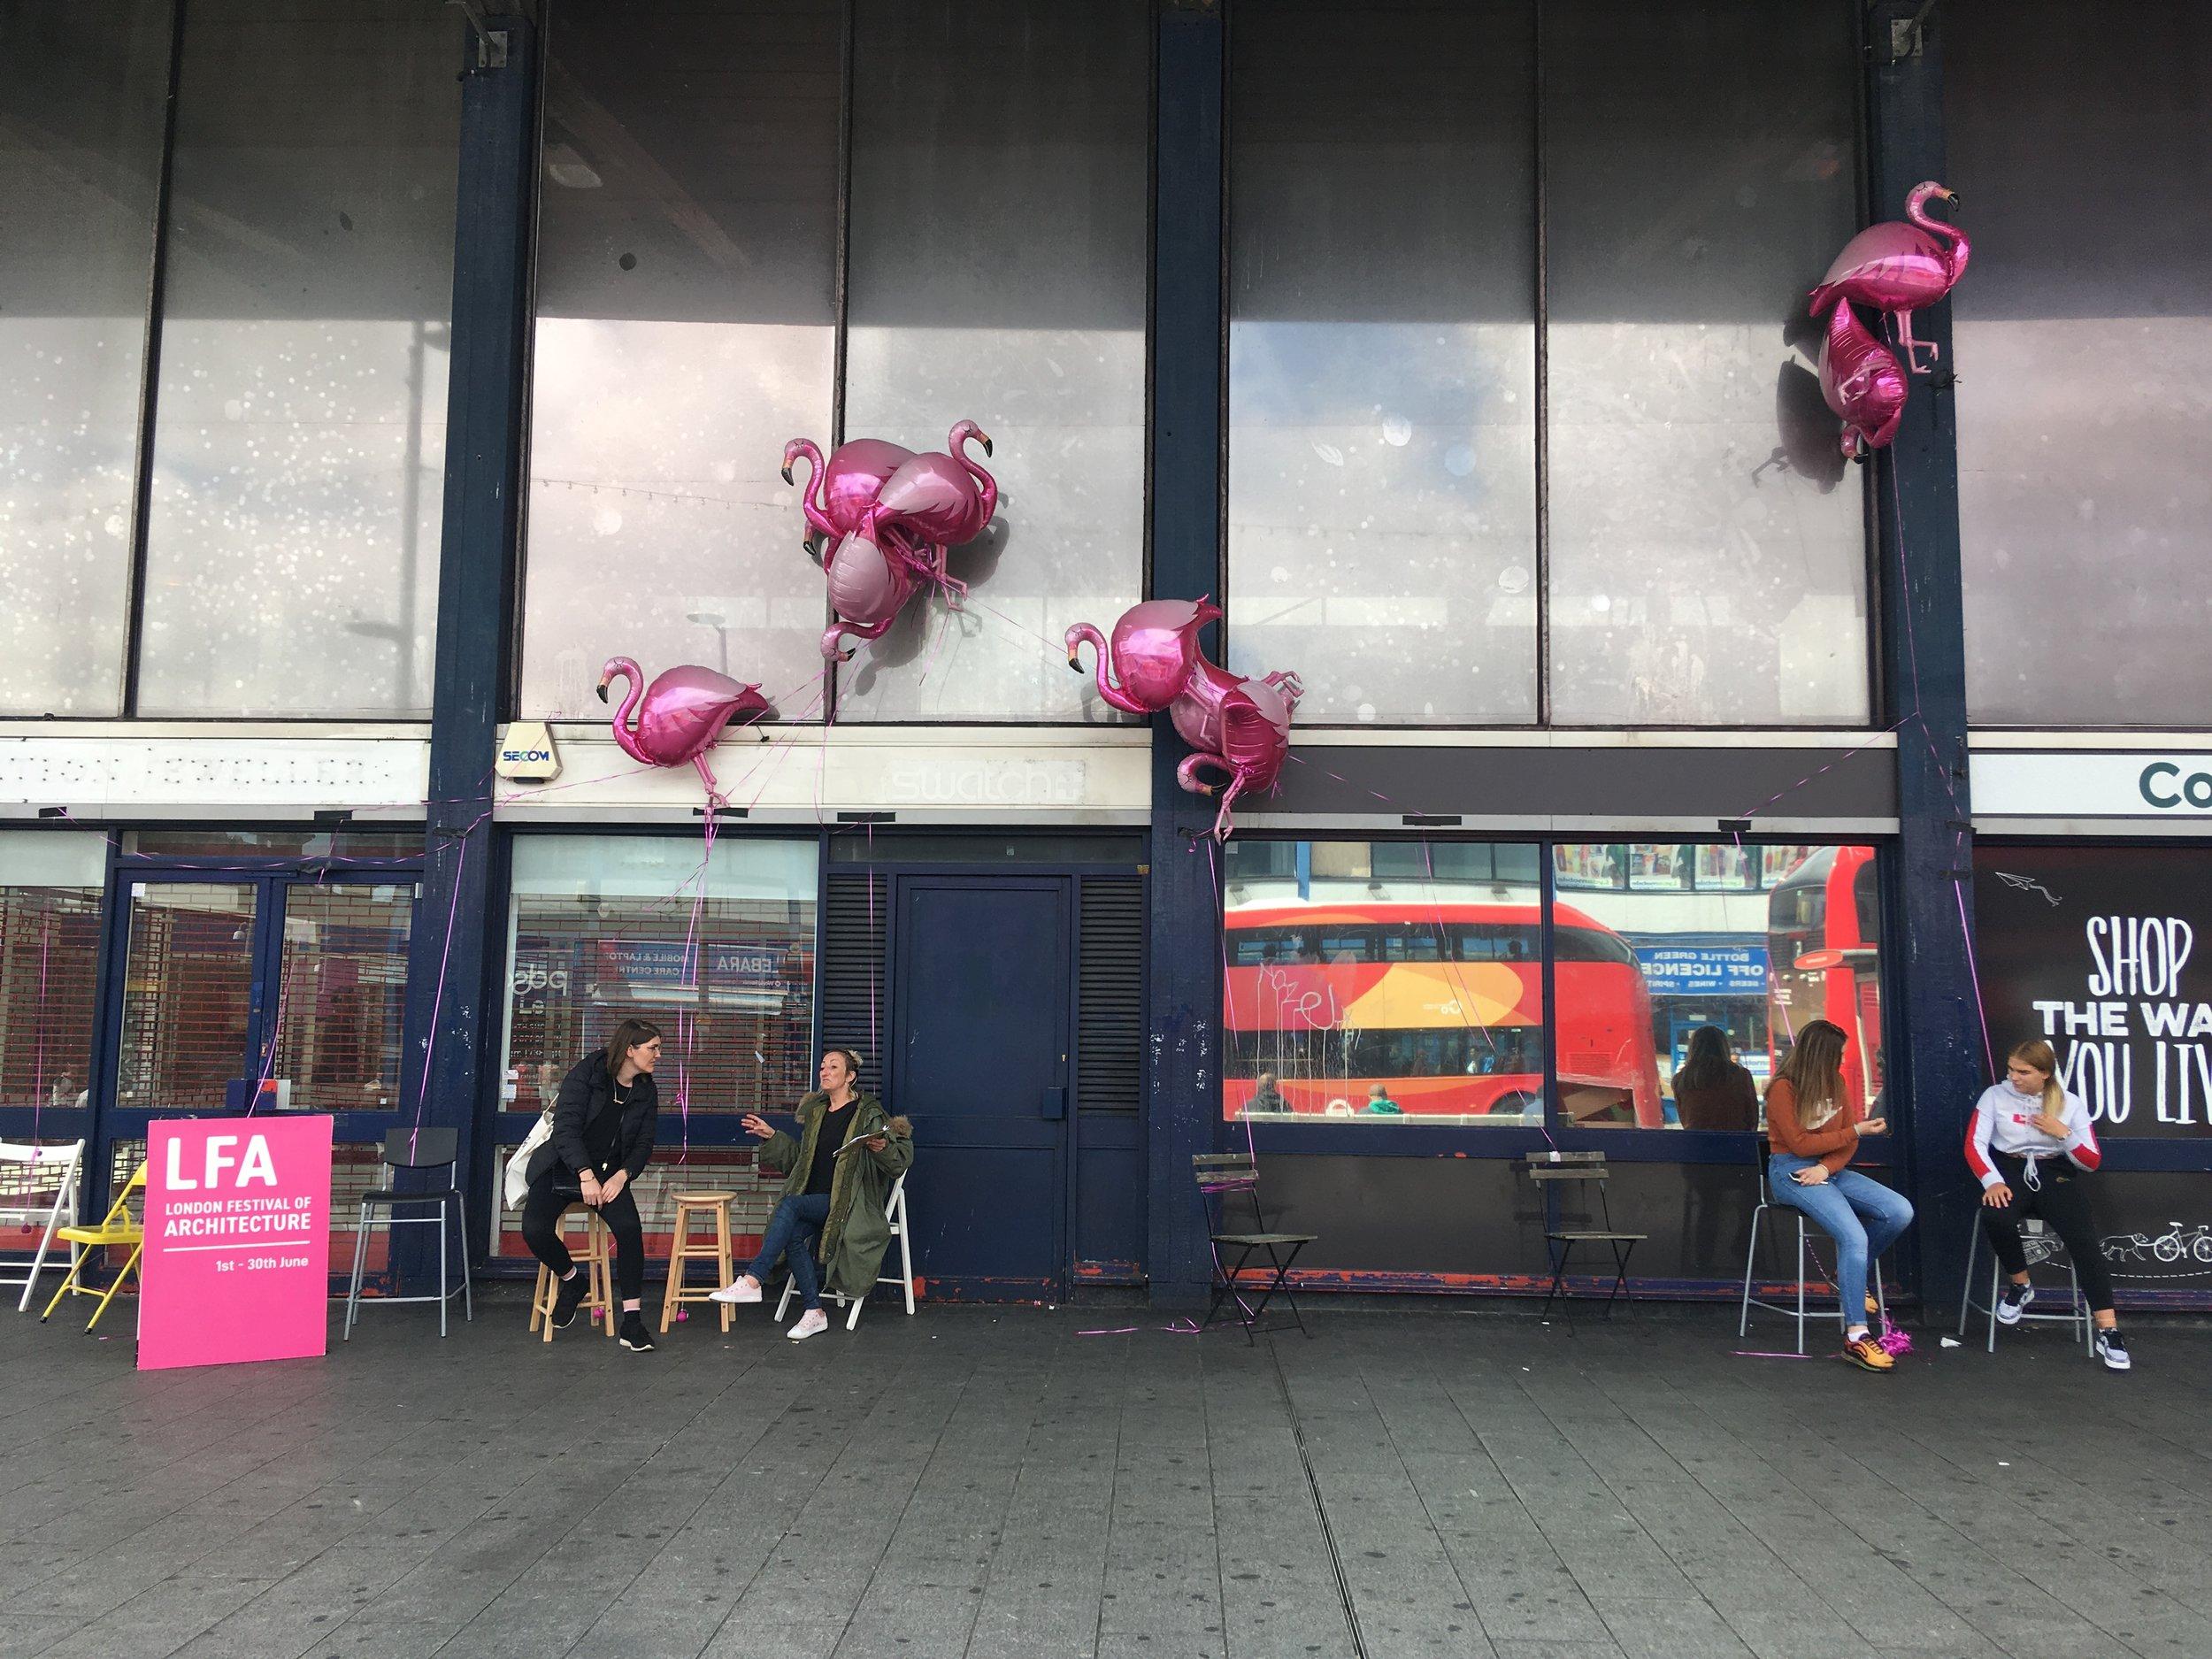 Prototyping flying flamingoes at Barking Station